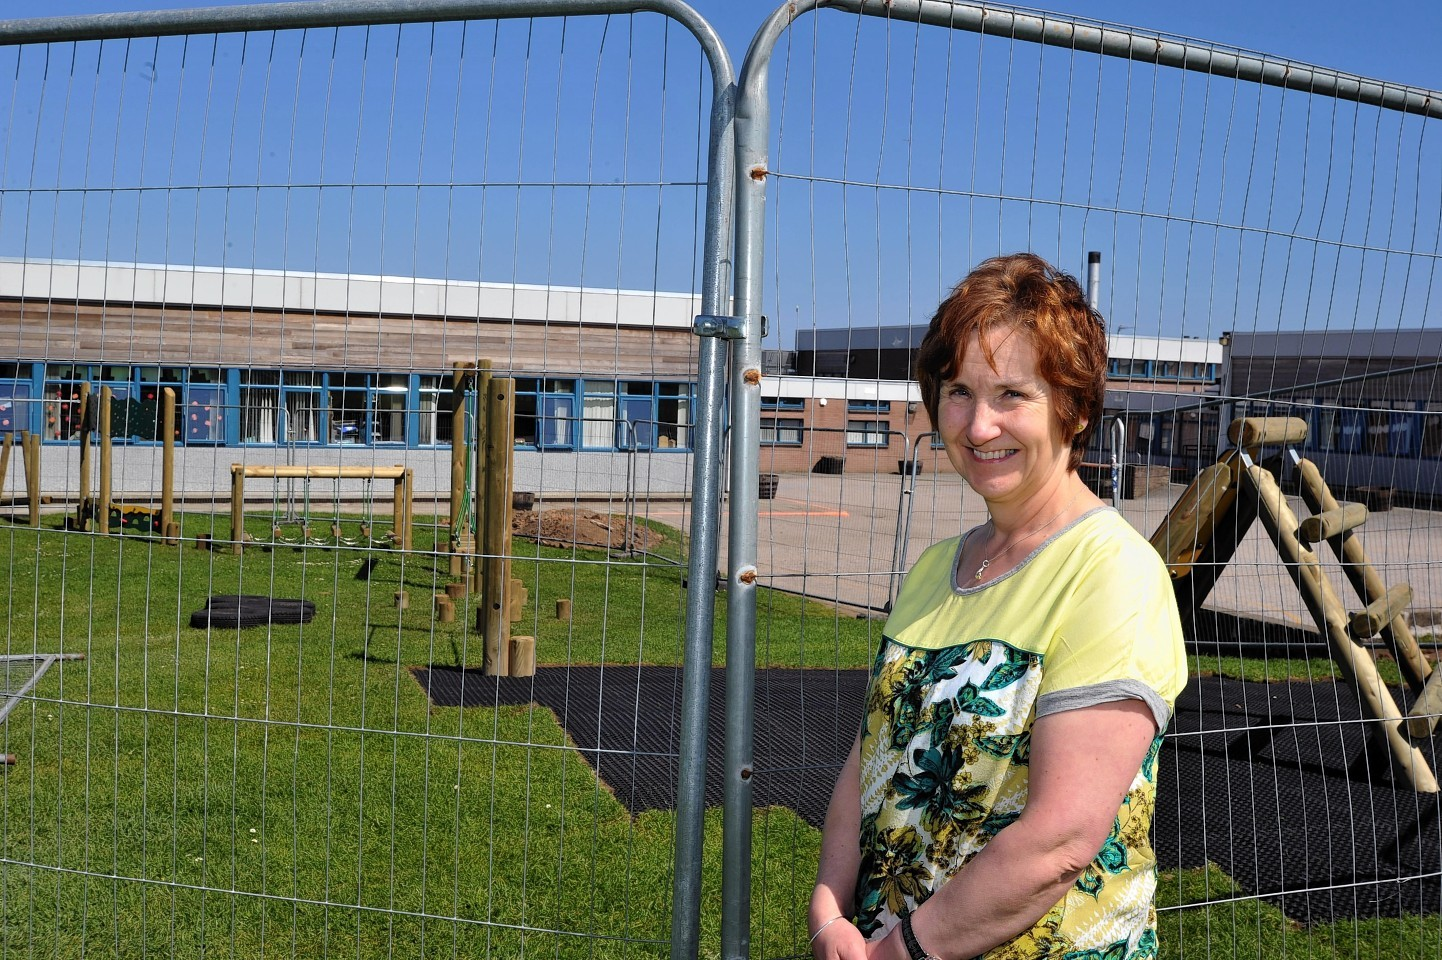 Clerkhill School work